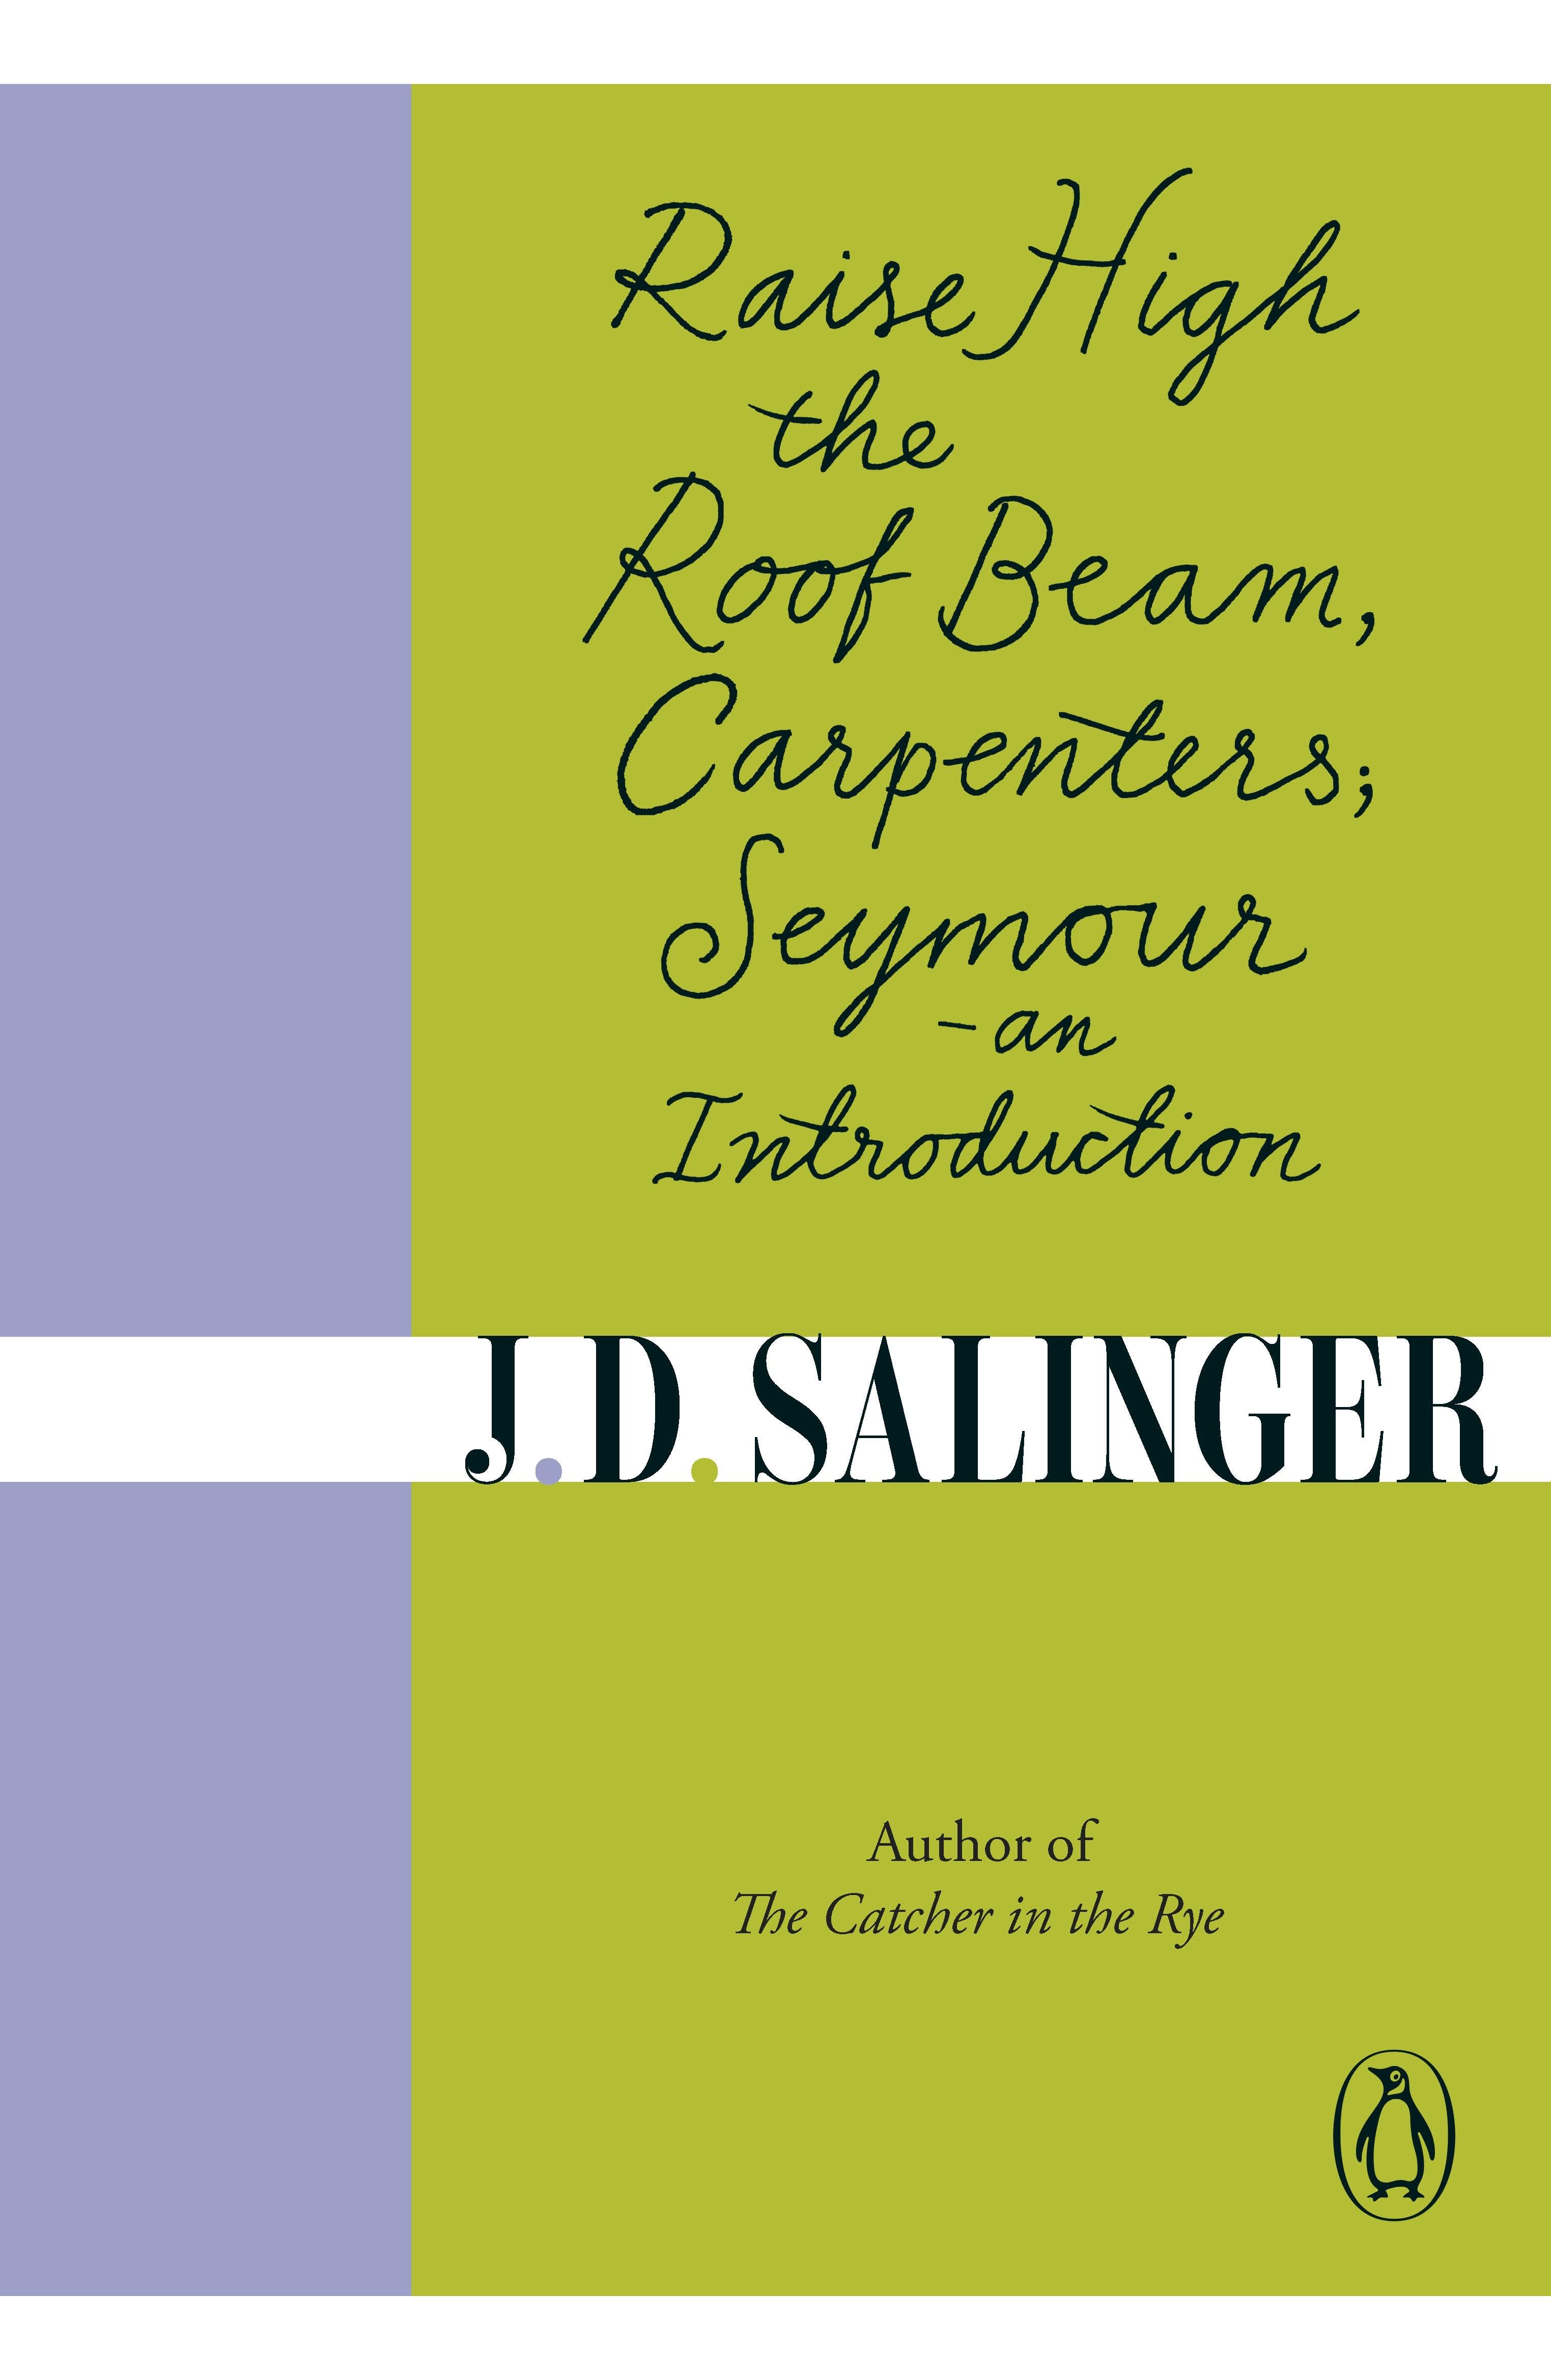 Raise High the Roof Beam, Carpenters; Seymour - an Introduction by J.D. Salinger - Penguin Books Australia